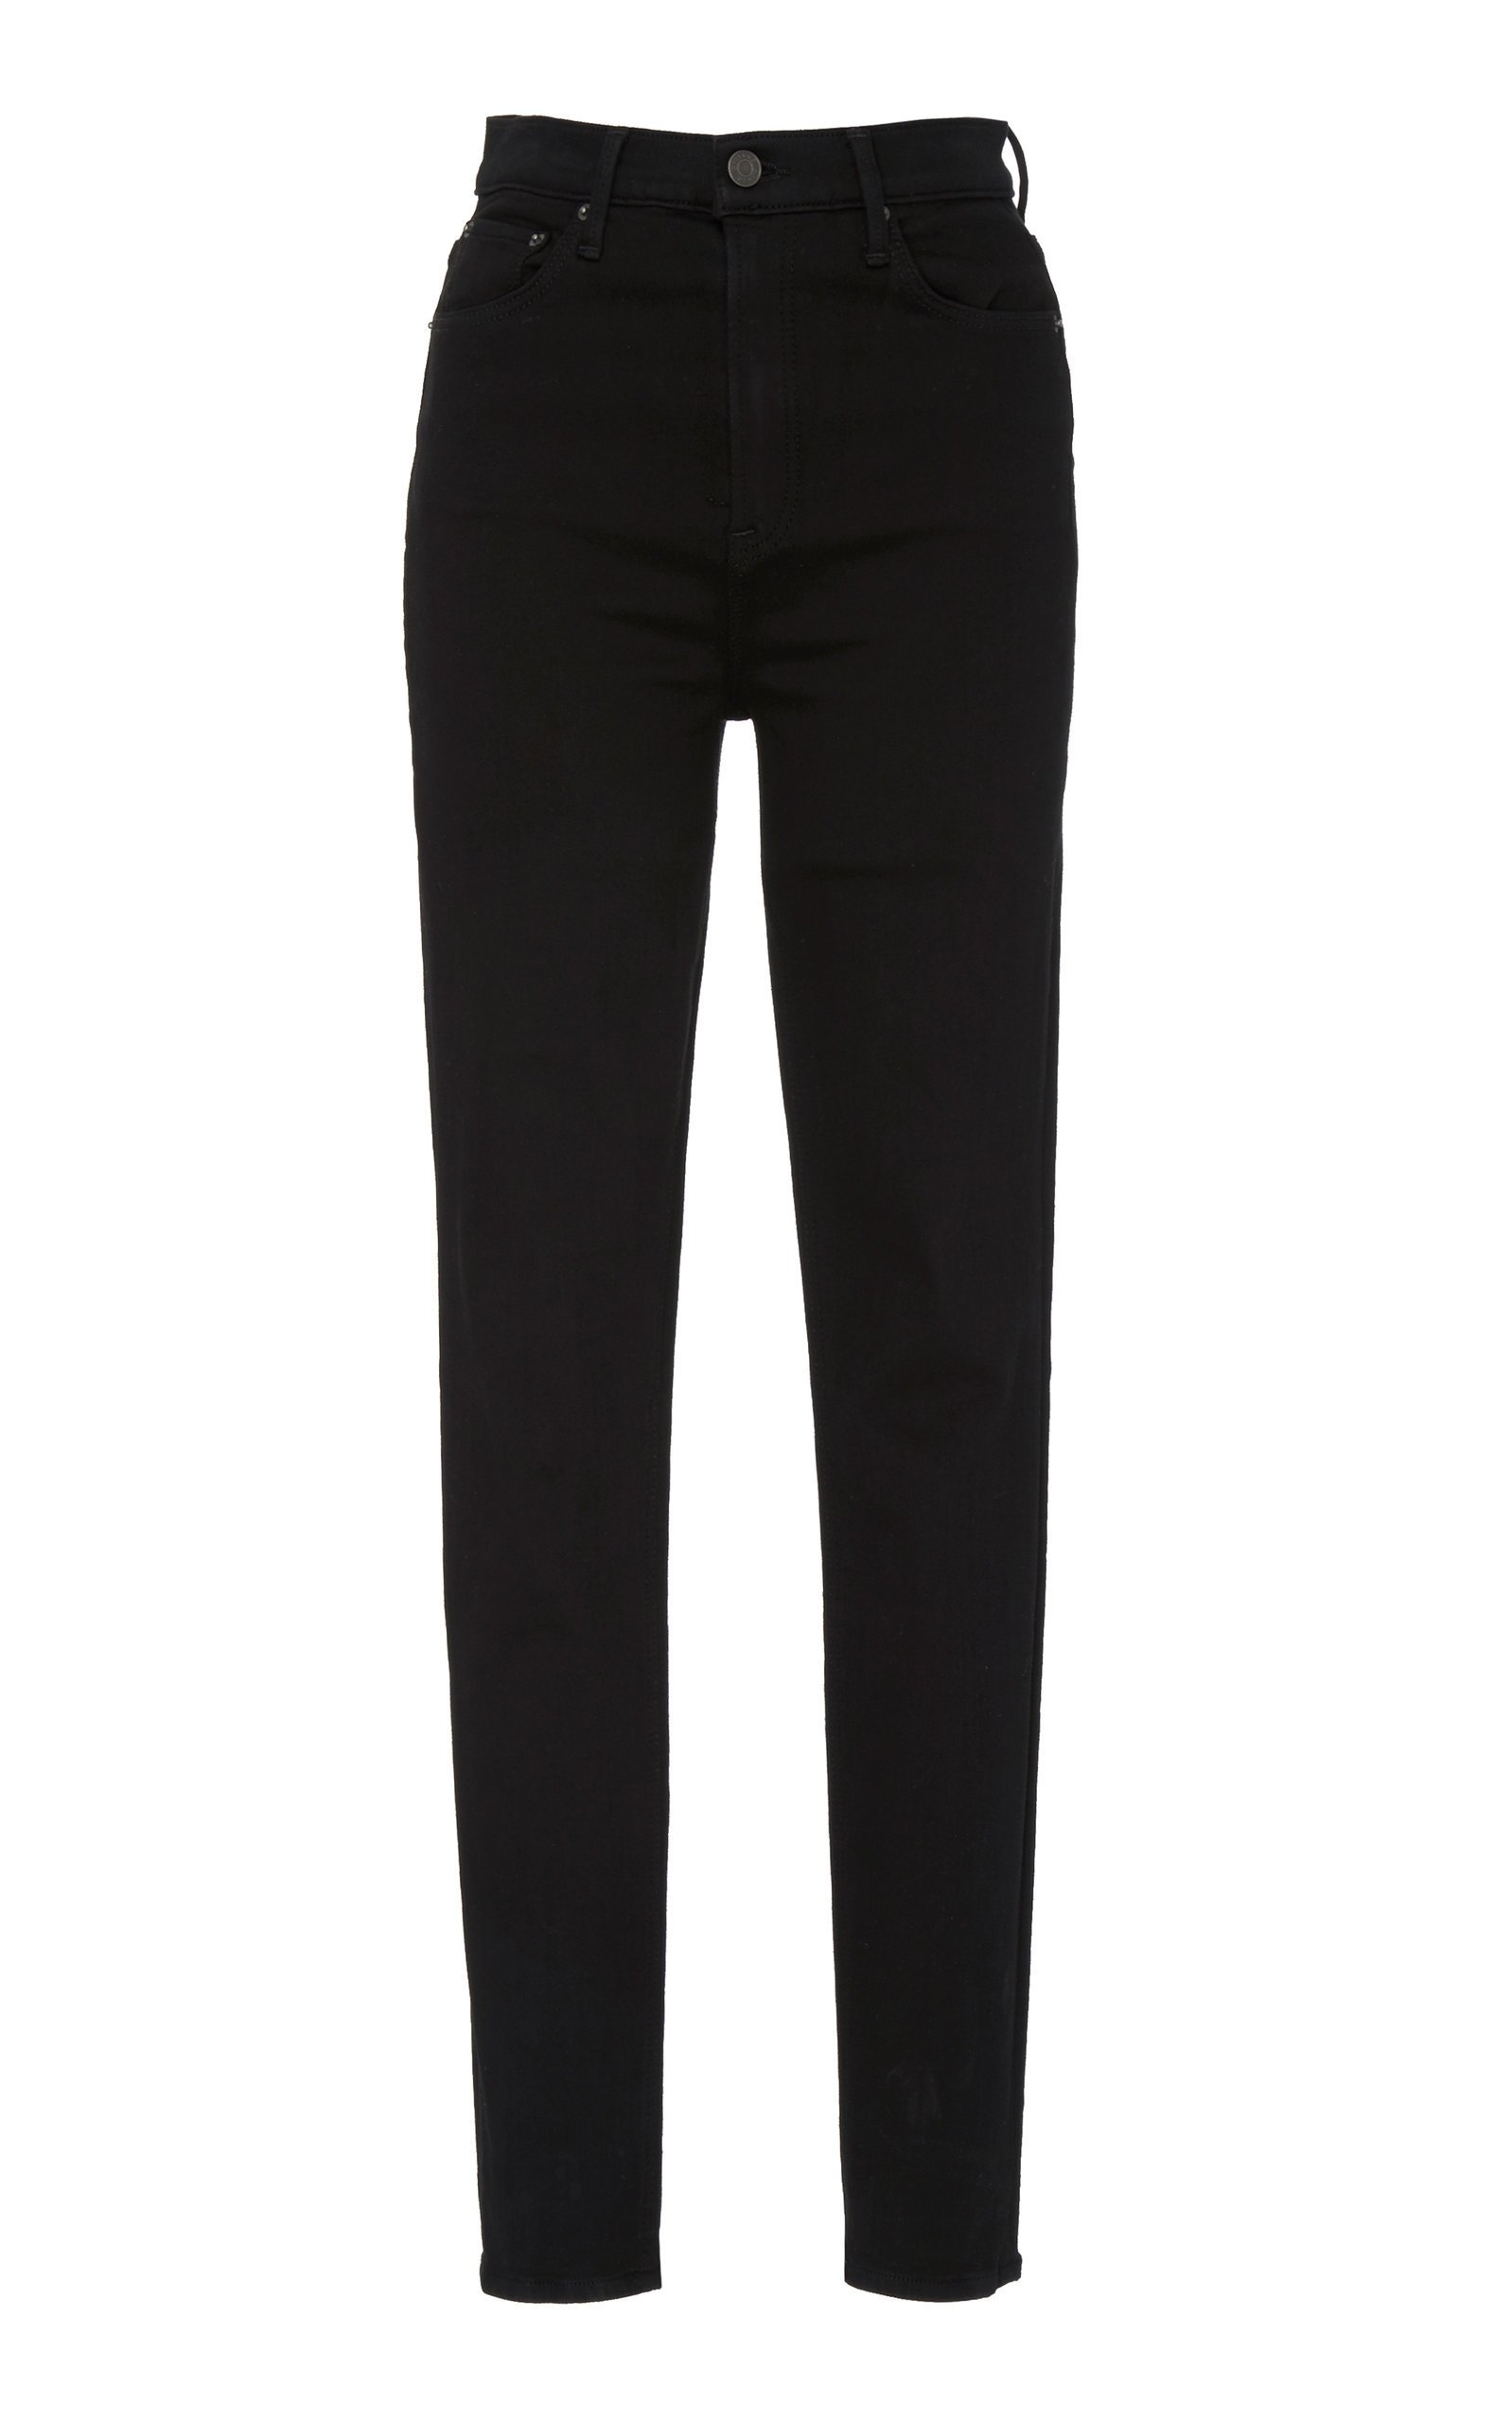 GRLFRND Denim Kendall High-Rise Skinny Jeans Size: 26